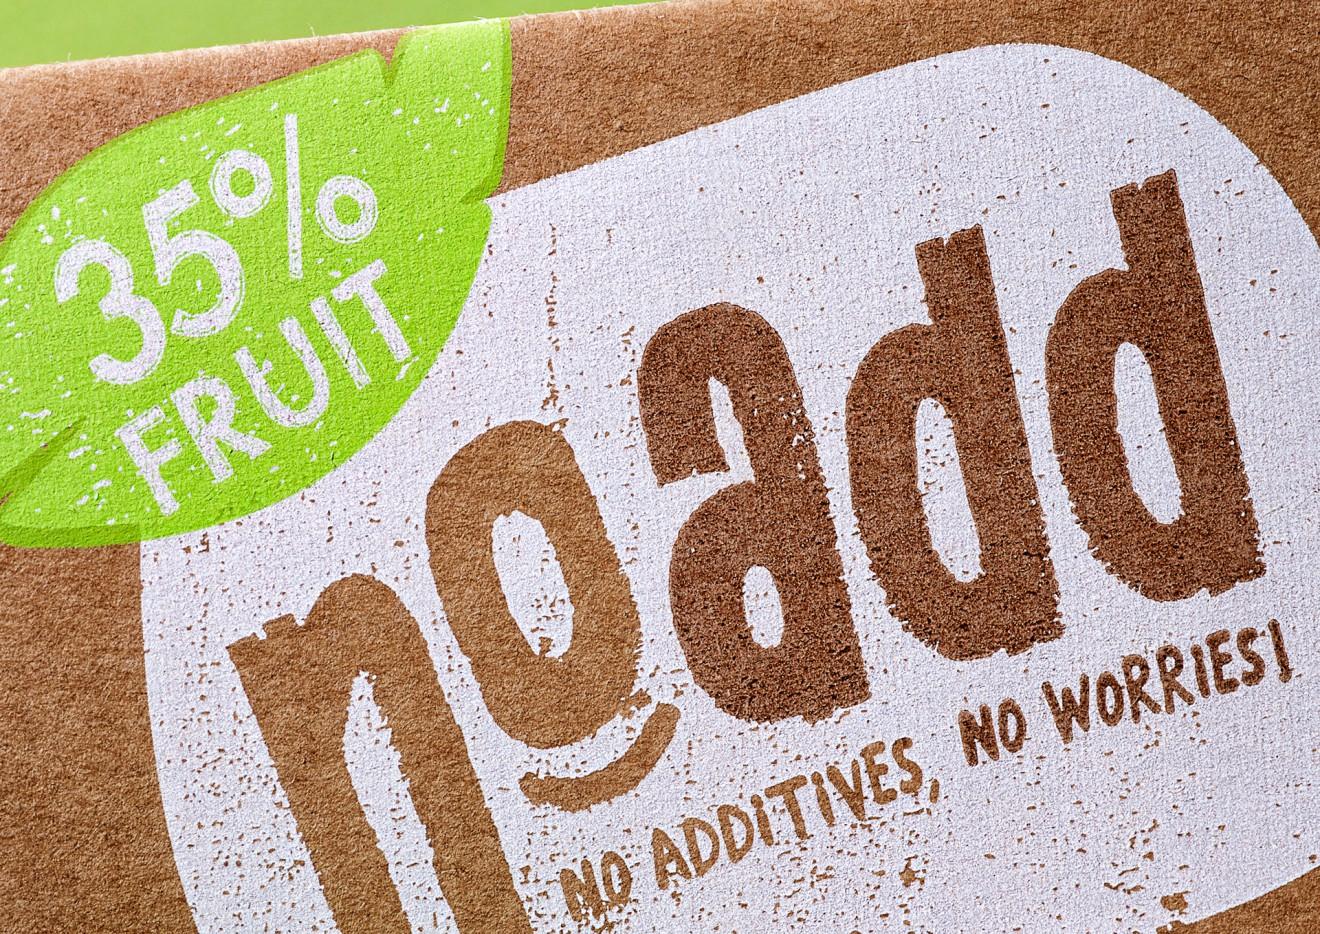 Quatre Mains package design - no add, fruit, no worries